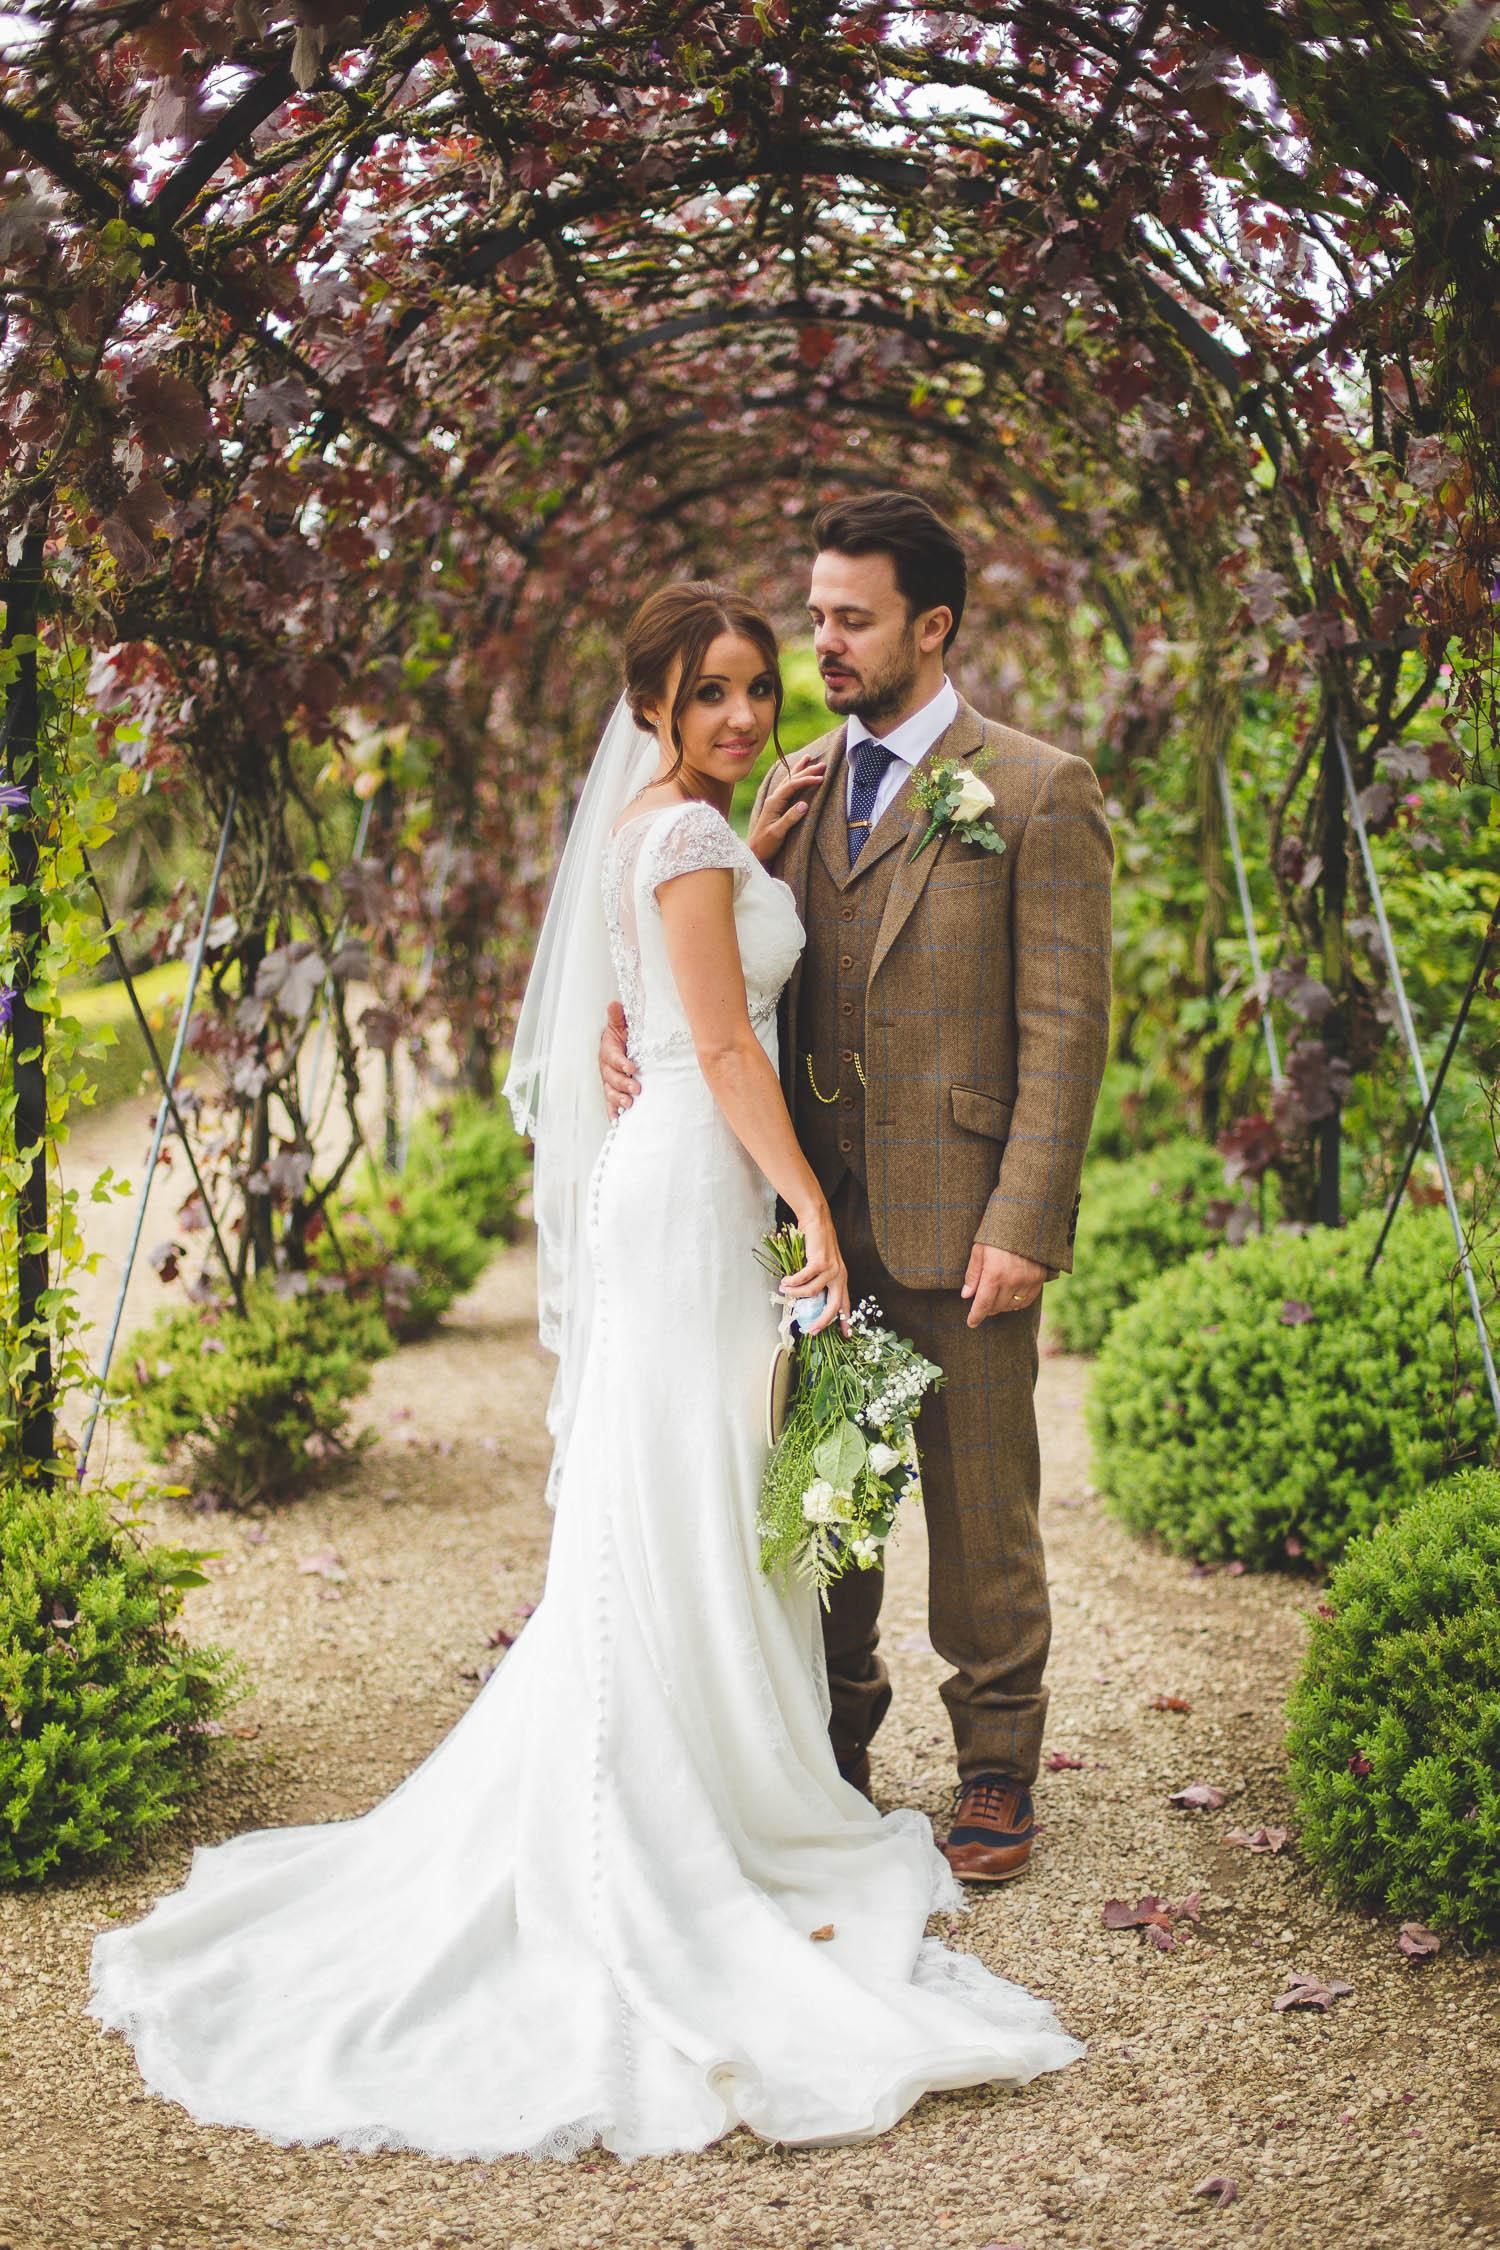 Surrey Wedding Photographer Jake Meg072.jpg